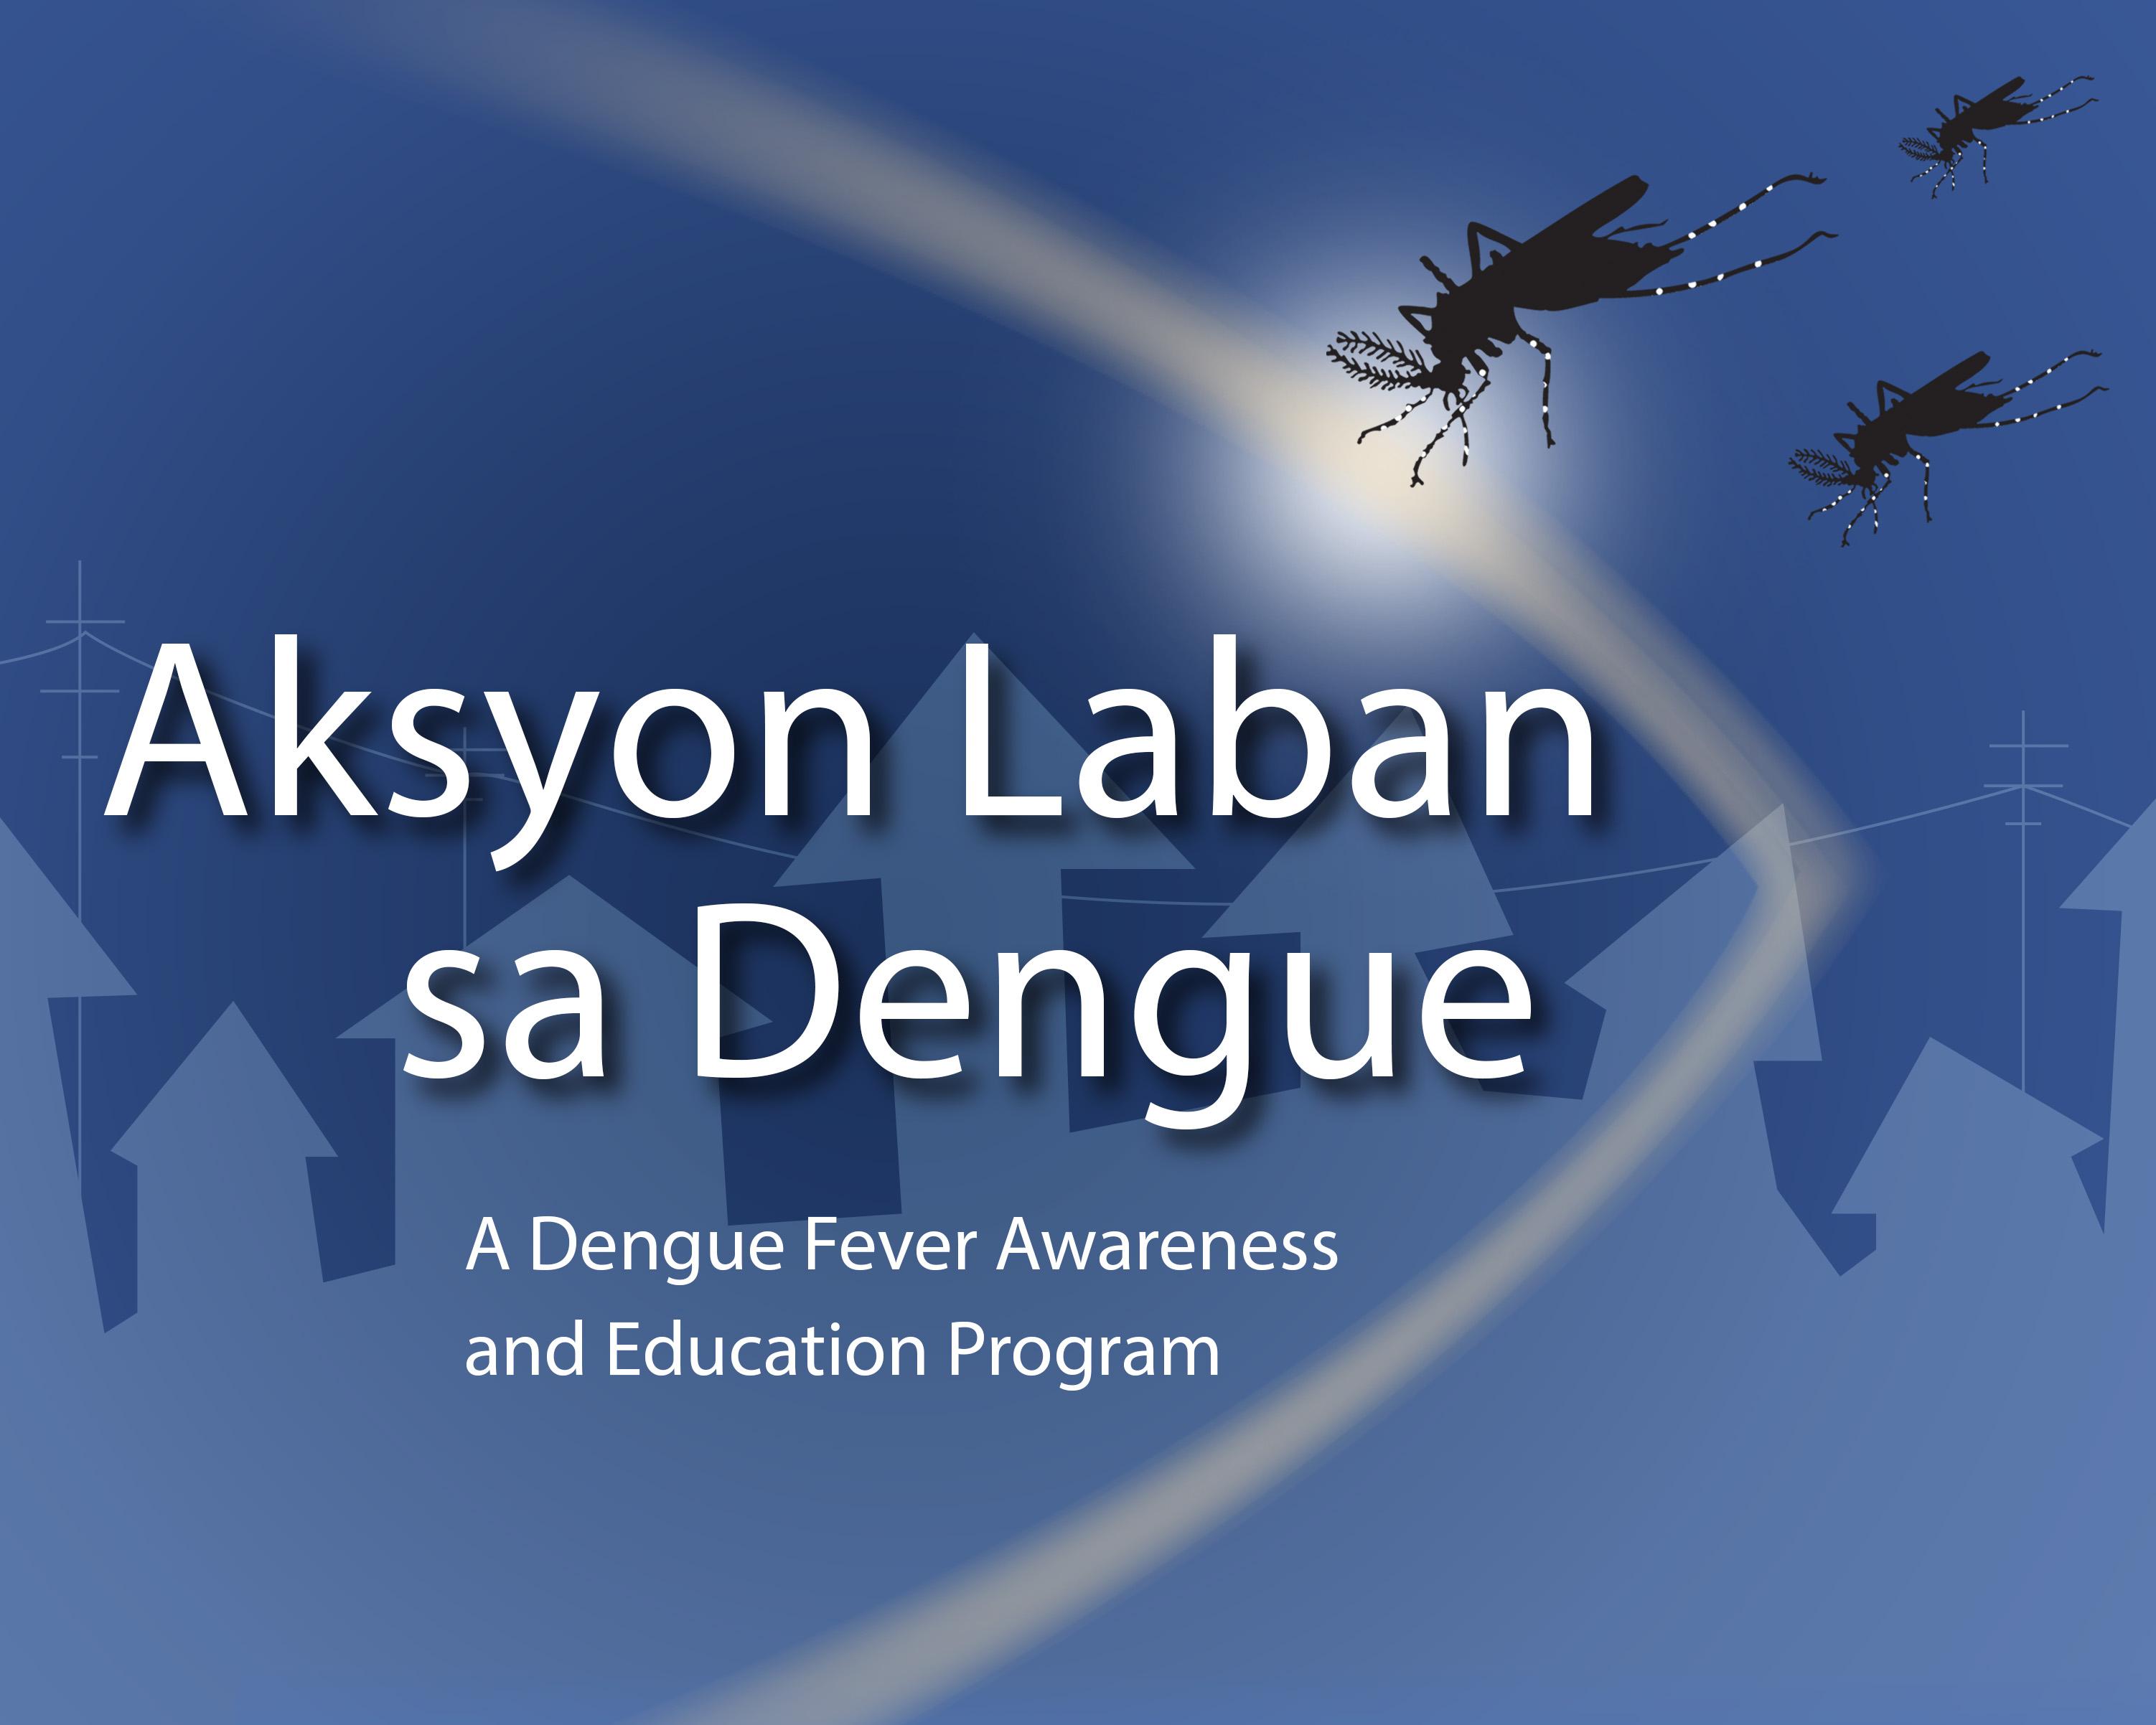 Aksyon Laban sa Dengue